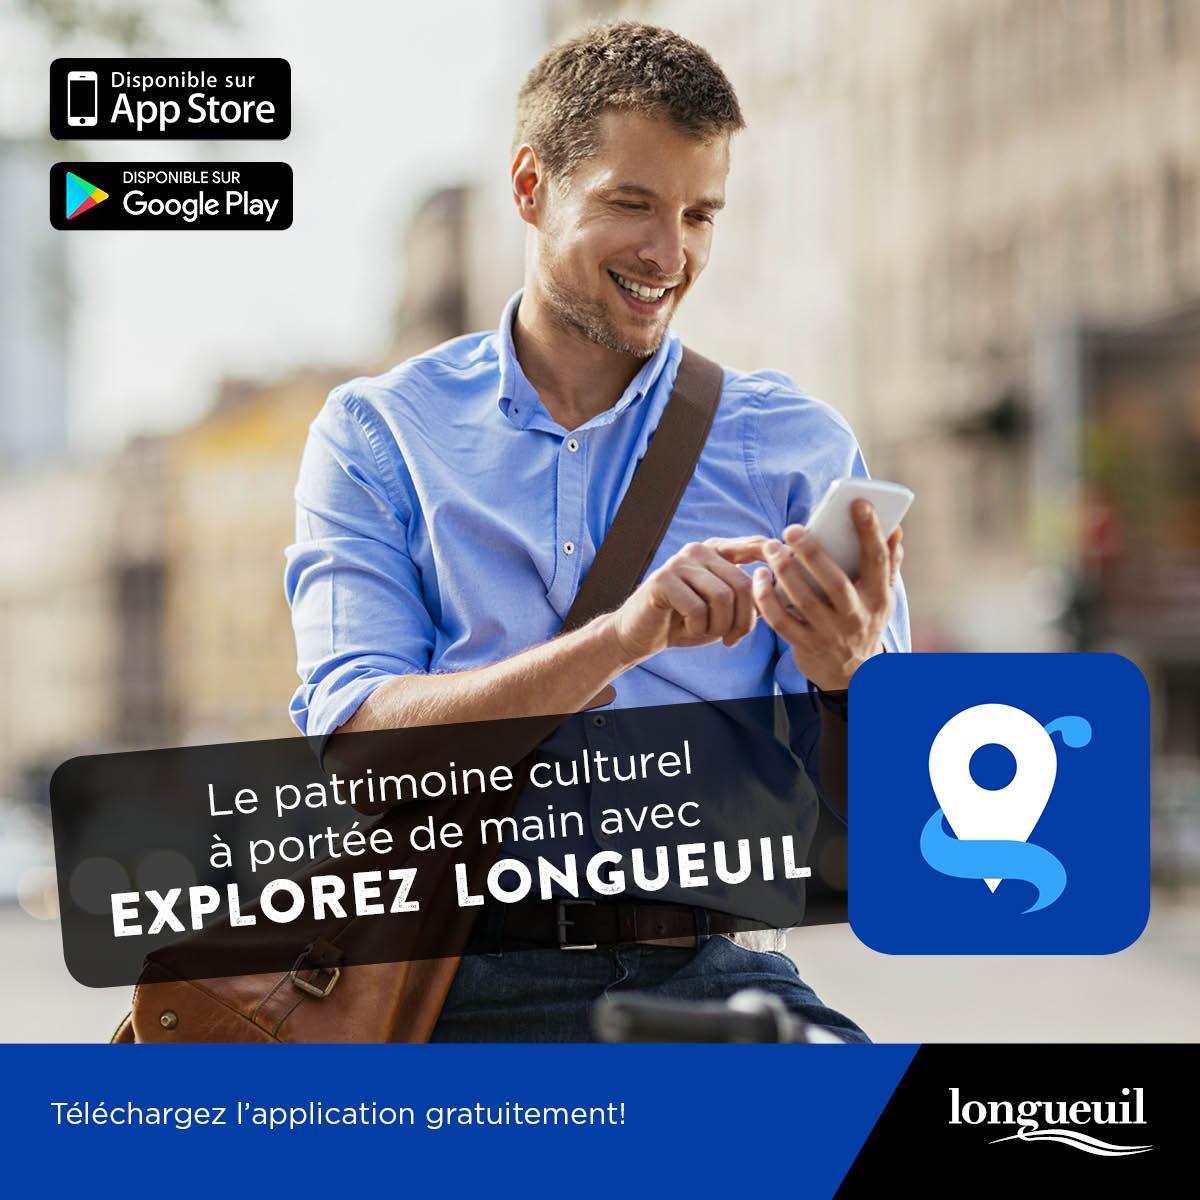 Explorez Longueuil